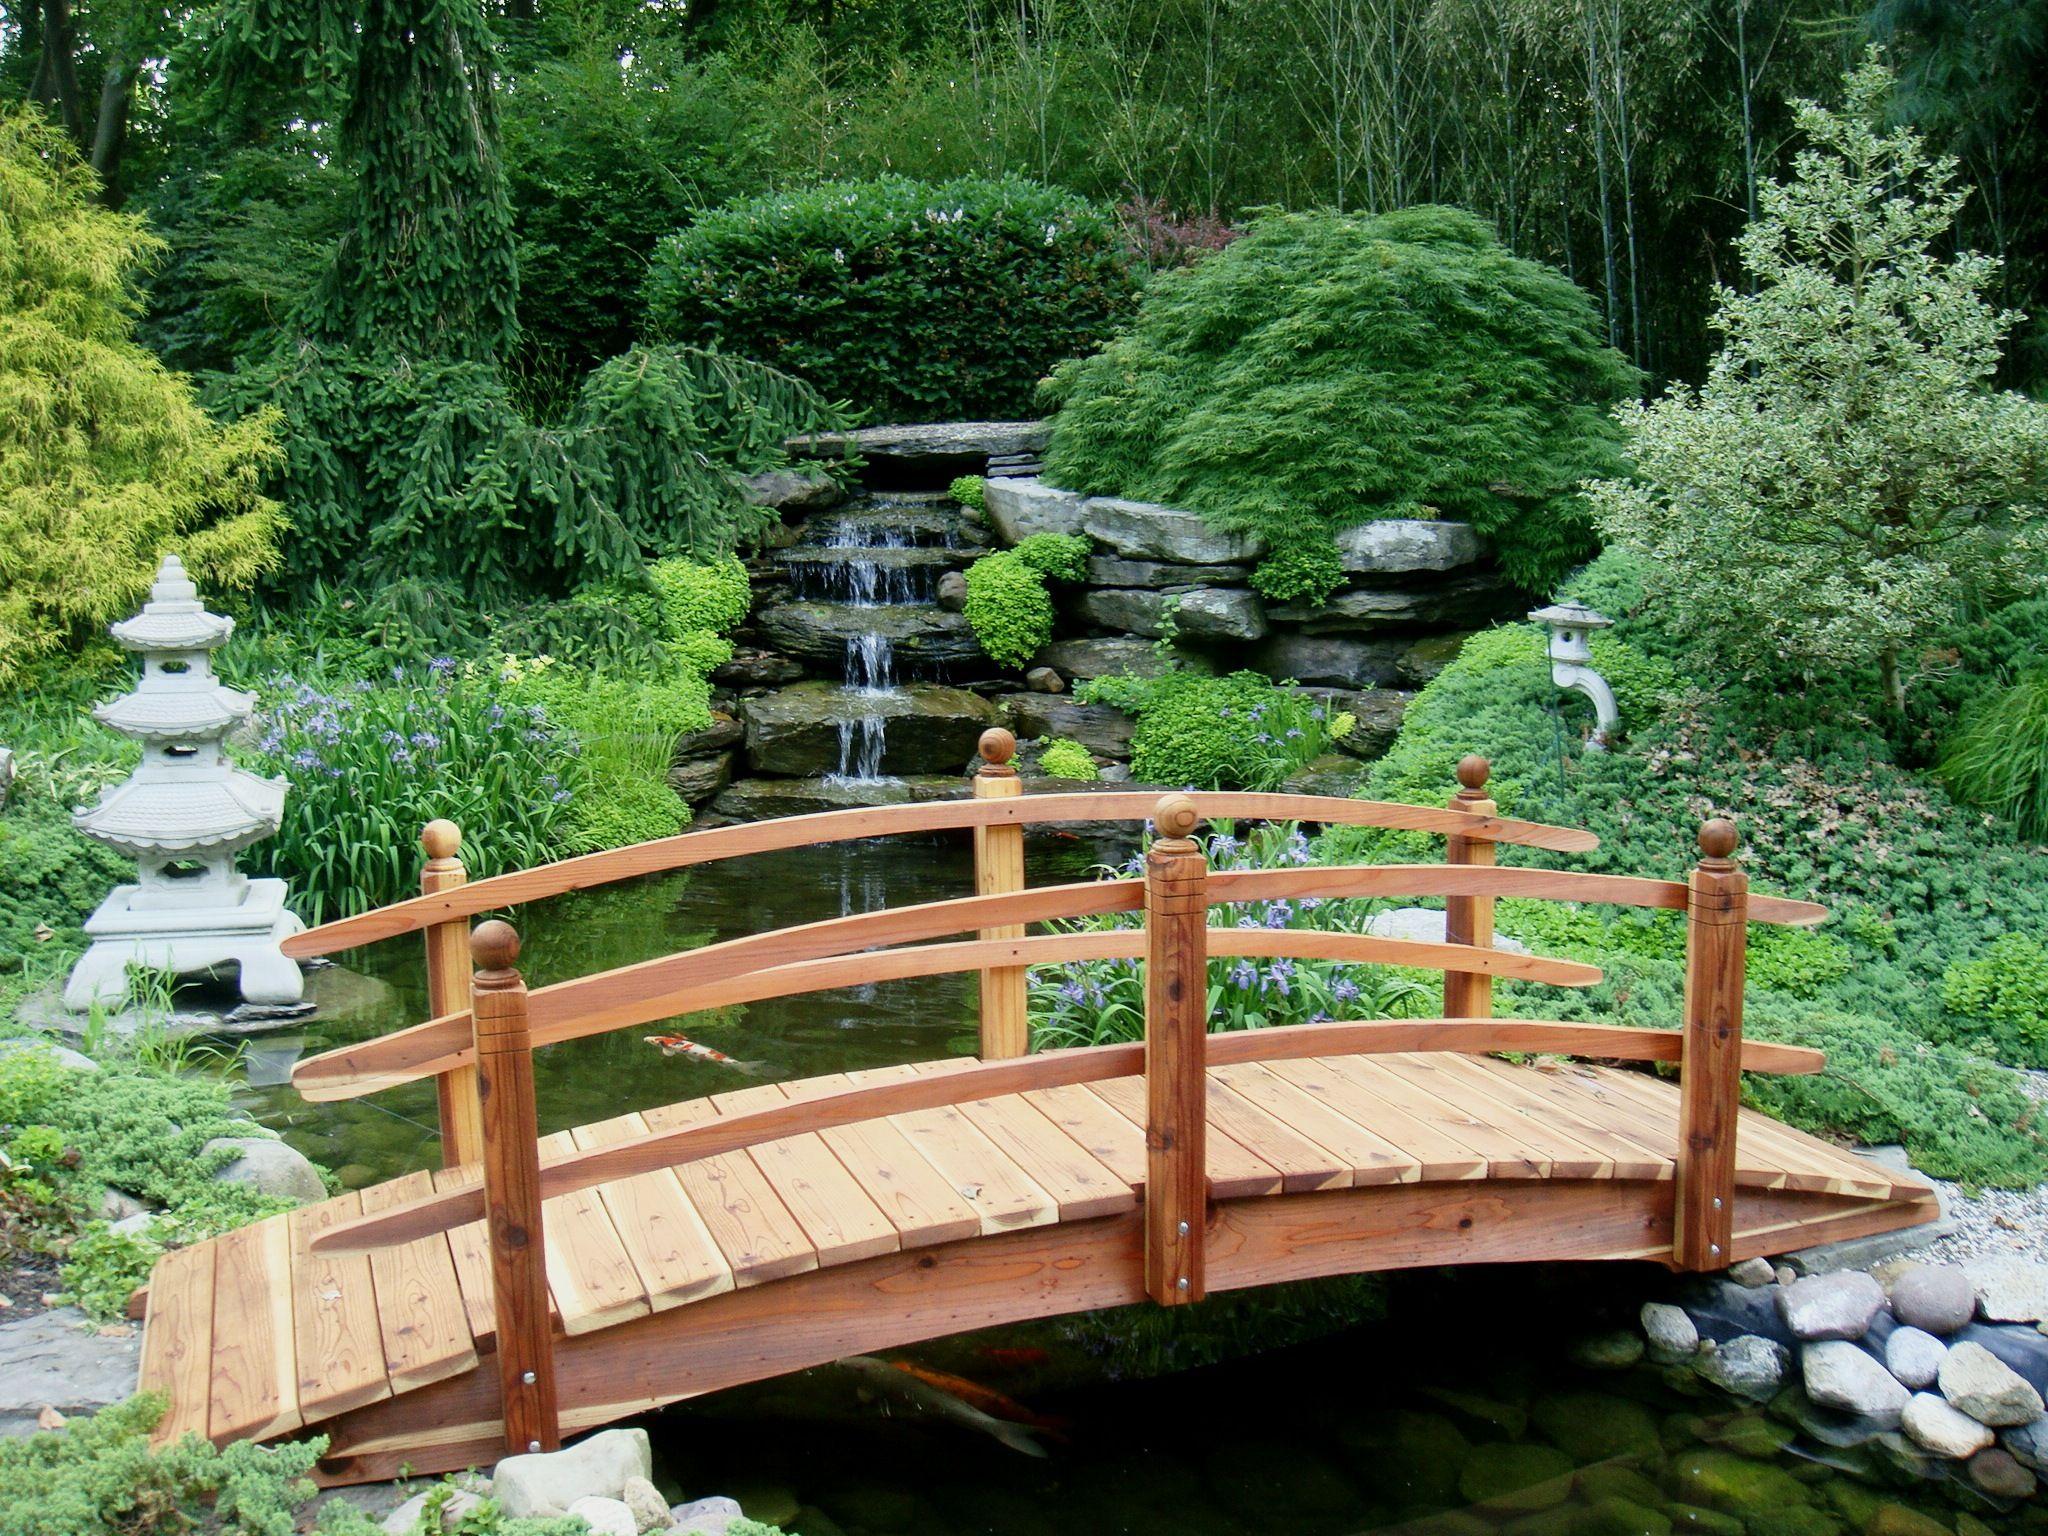 Wooden Garden Bridge Designs 14ft Double Selection Of Amazing